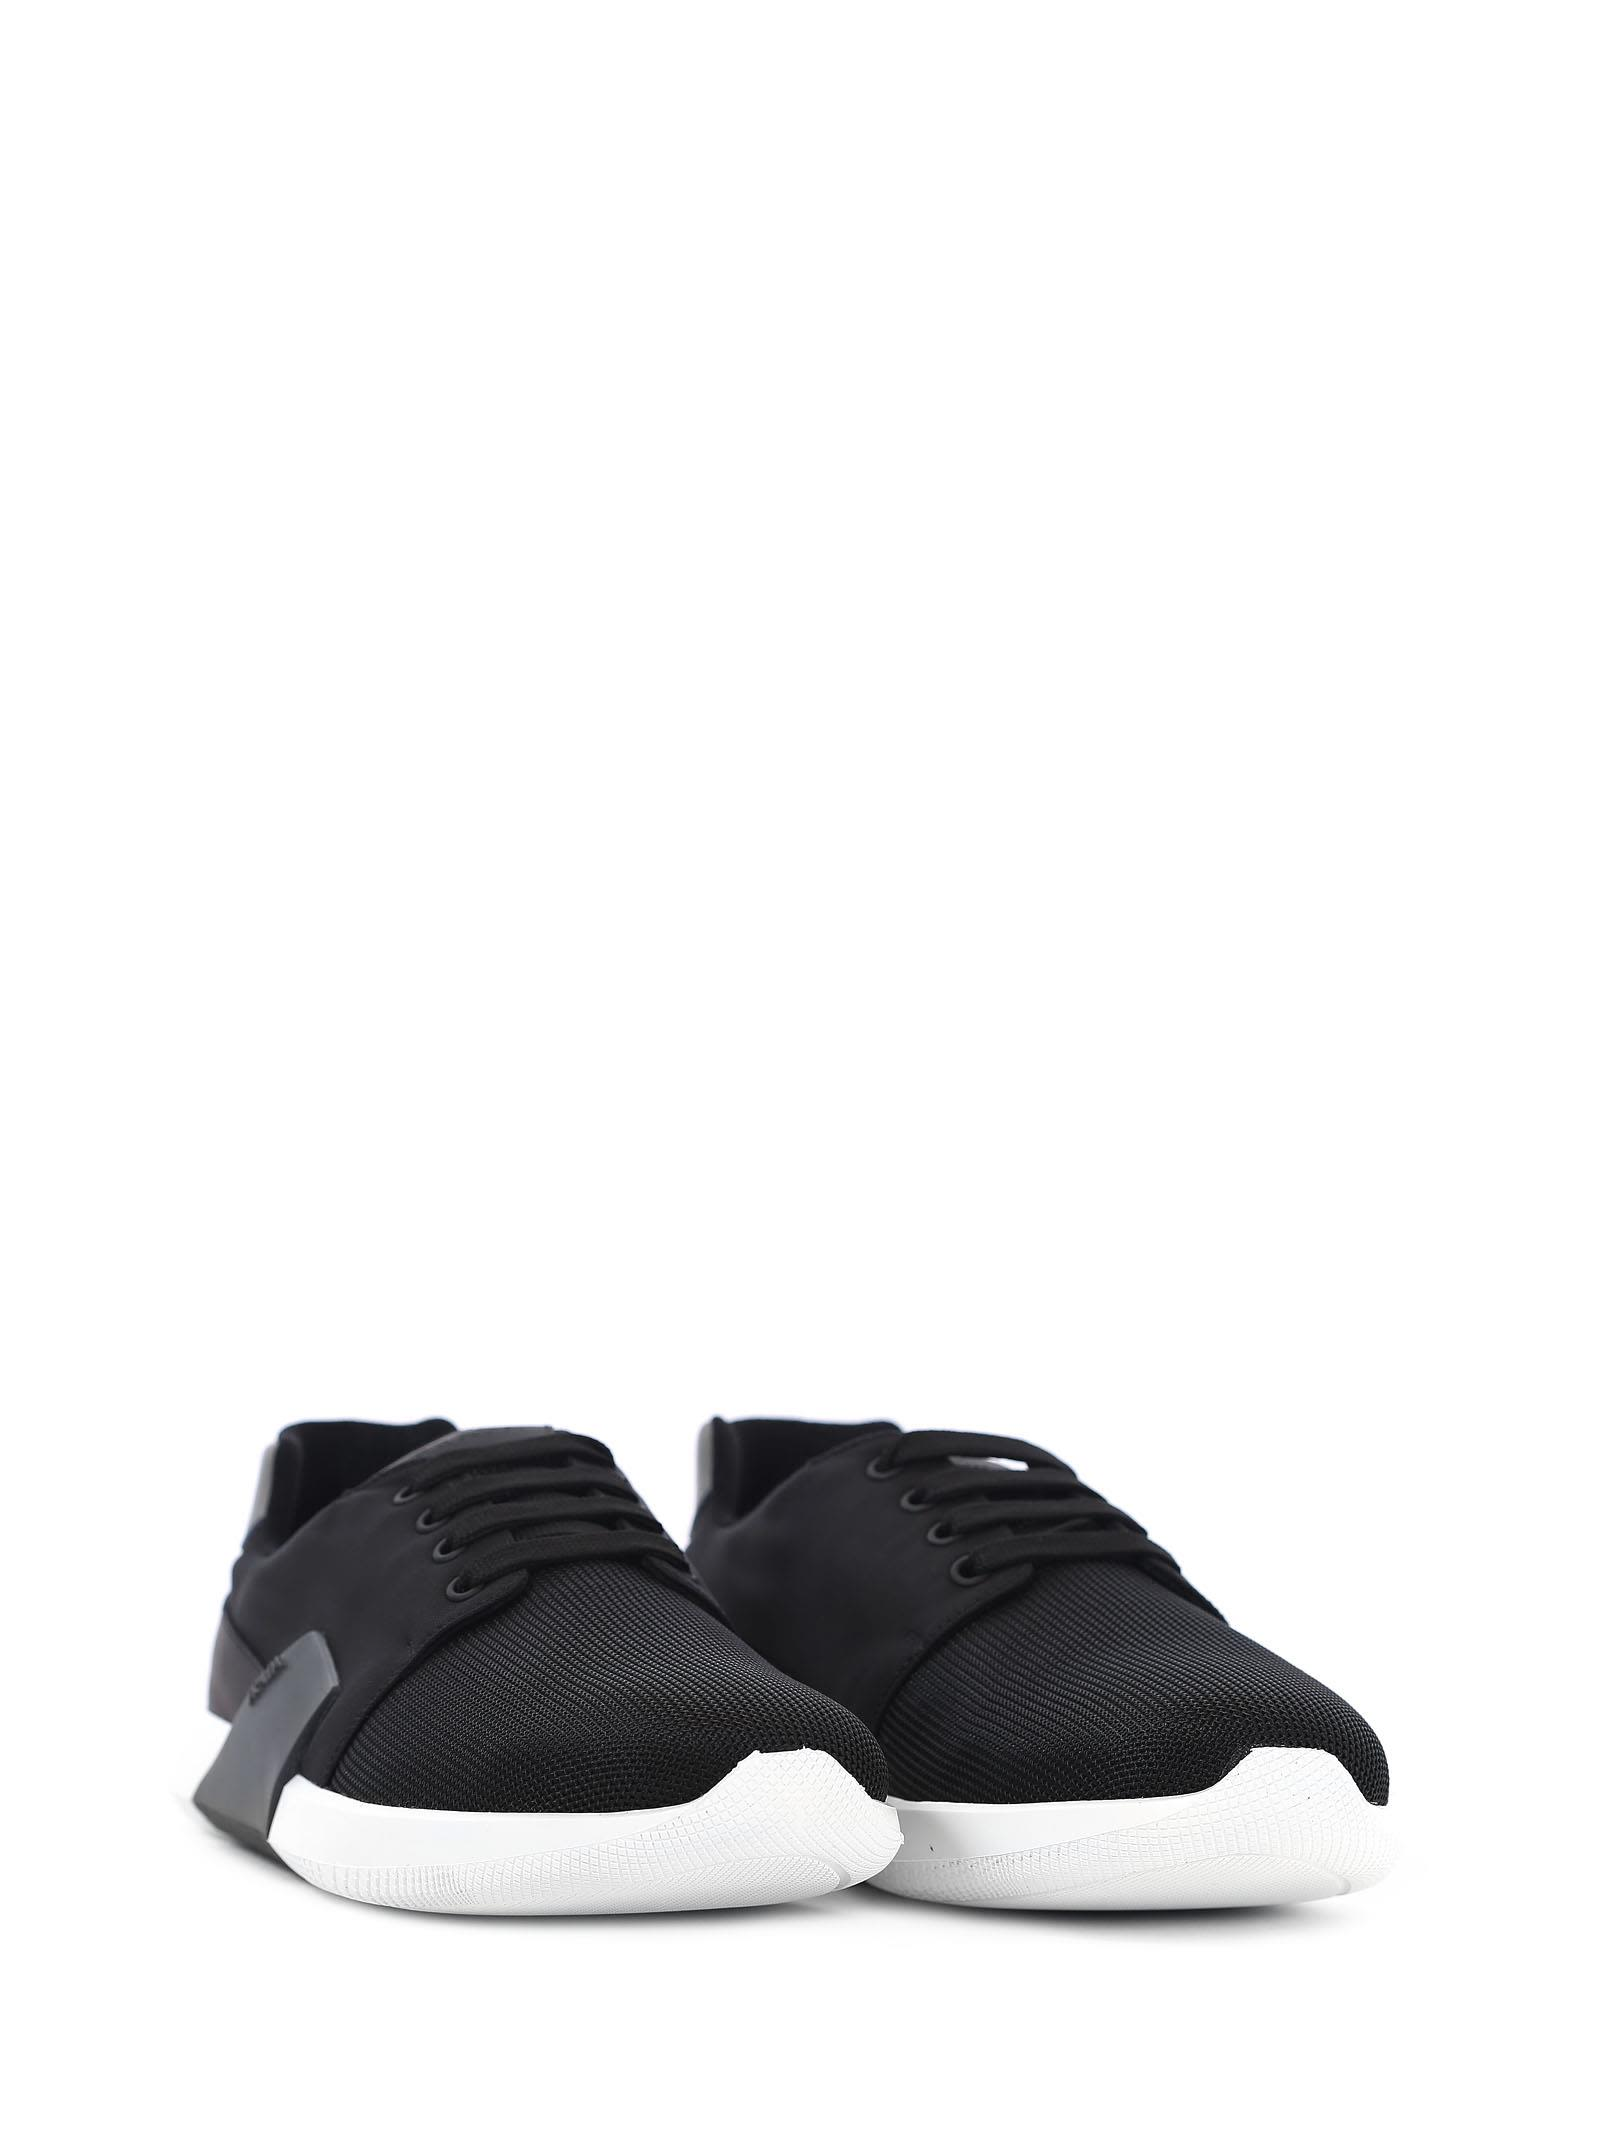 With Mastercard Online Buy Cheap Largest Supplier Prada Leather & Canvas Sneakers Amazon Cheap Price Orange 100% Original KtAN67Uw5e